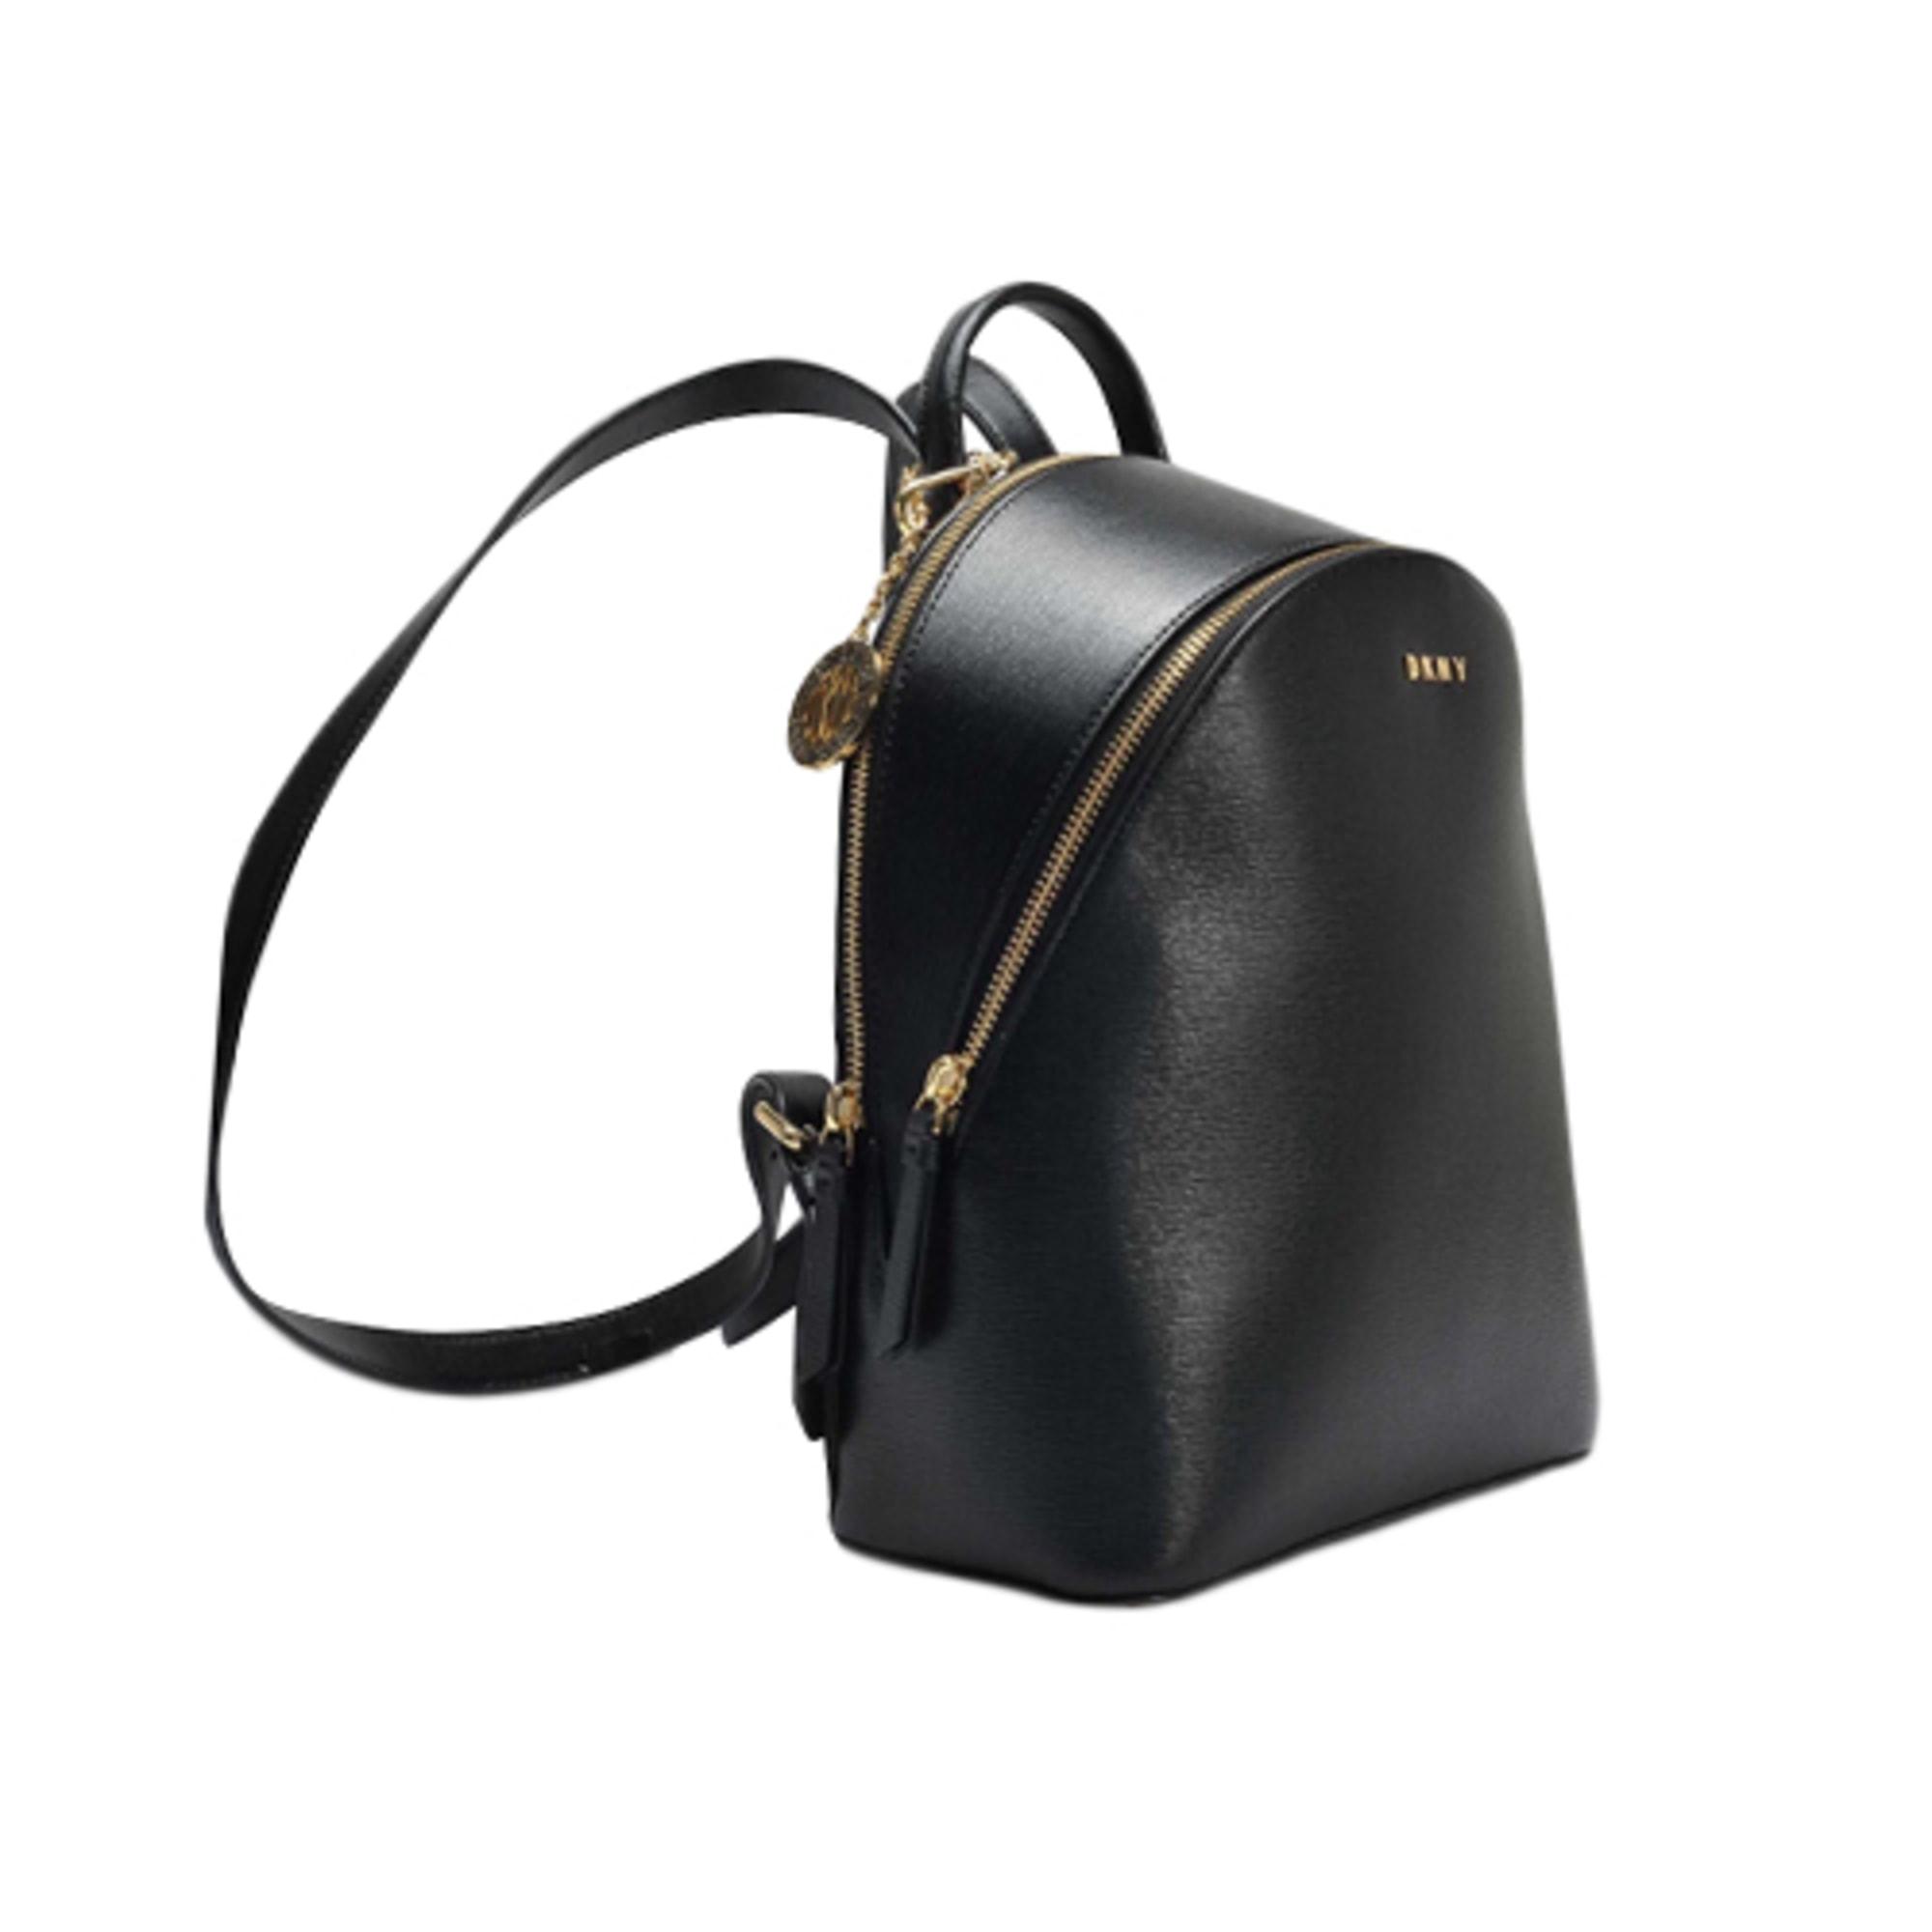 Backpack DKNY Black